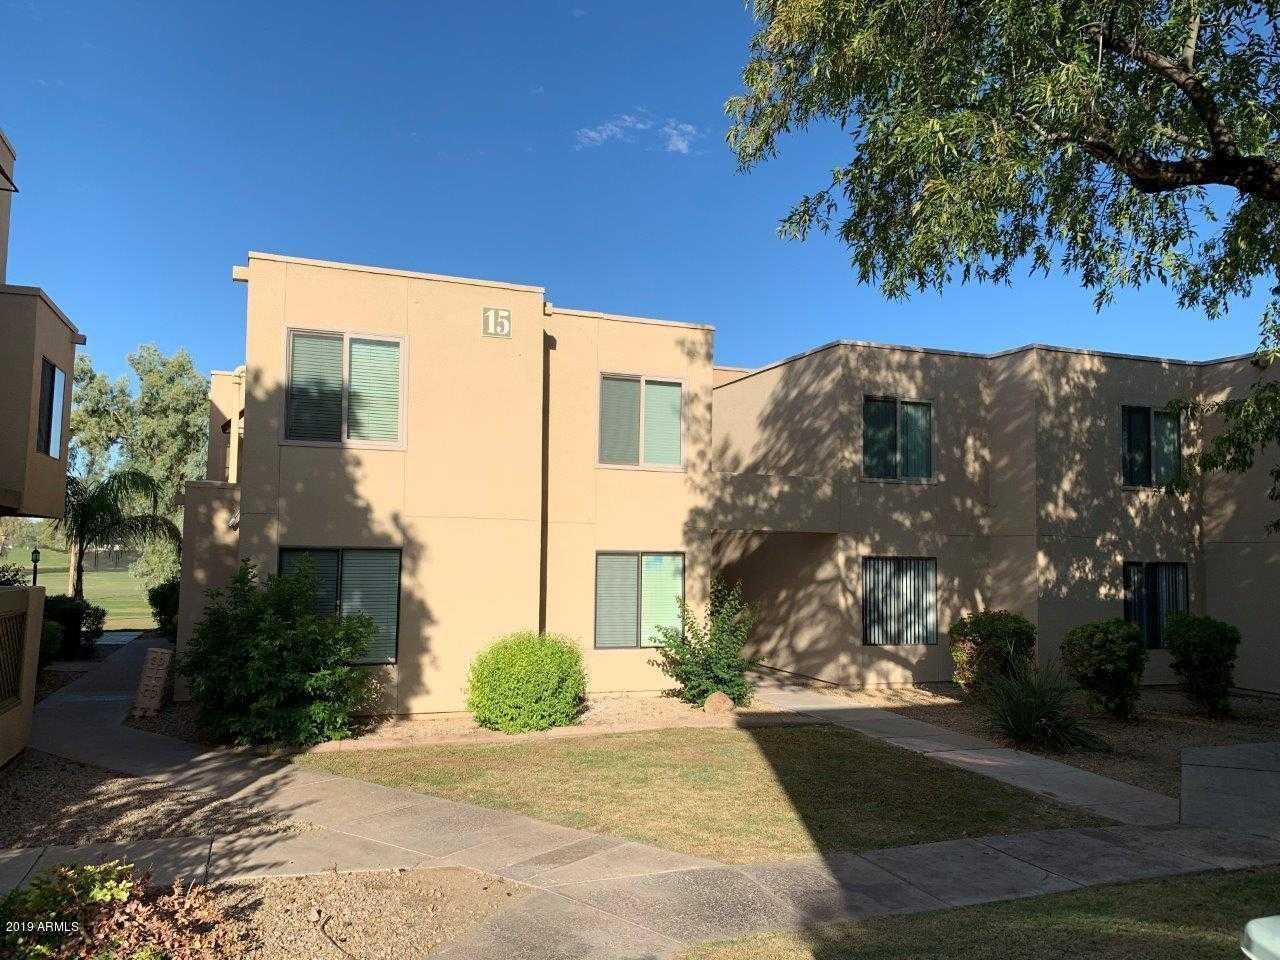 $224,900 - 2Br/1Ba -  for Sale in Sunrise Phase 1 Condominium, Scottsdale